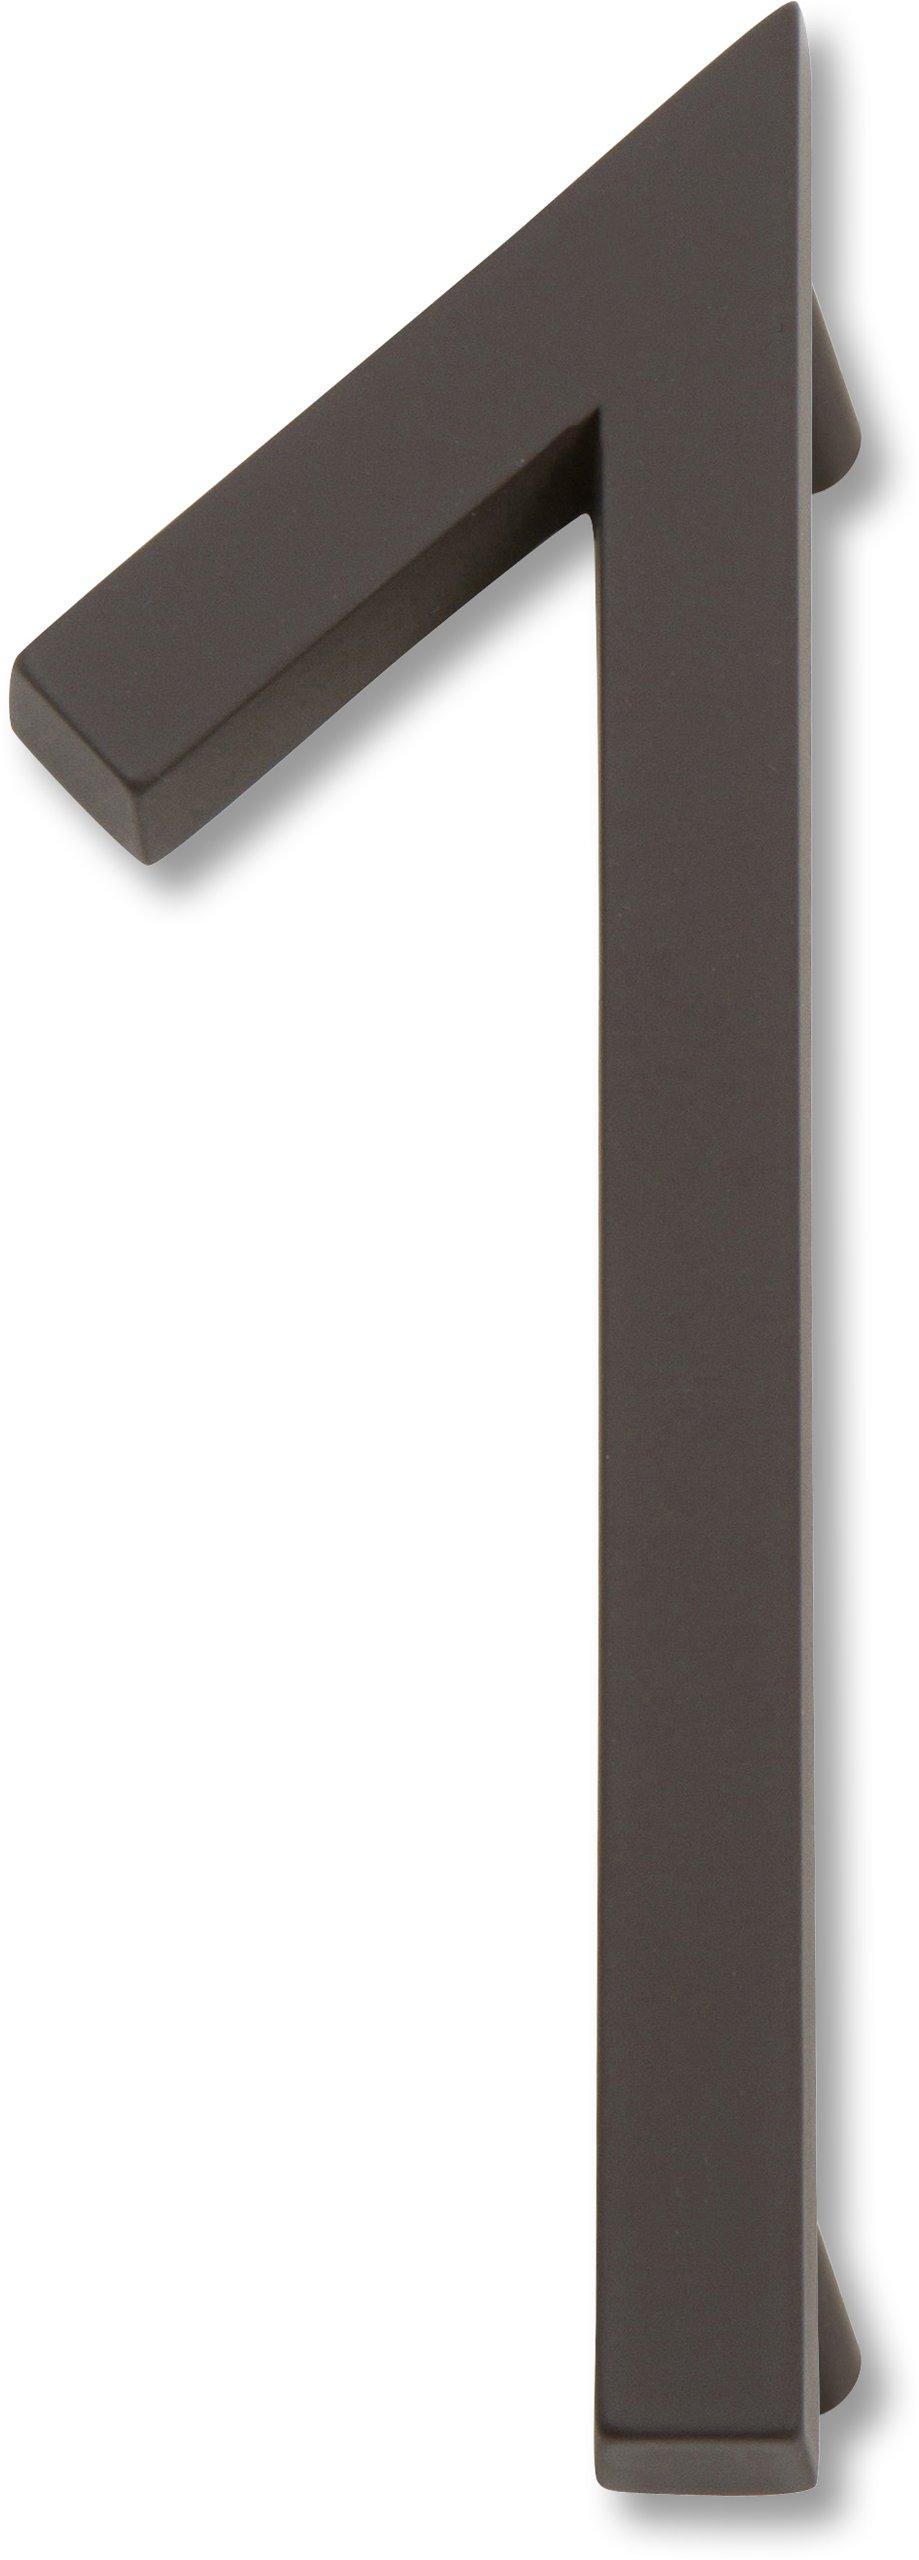 Atlas Homewares AVN1-O Modern Avalon 4.5-Inch No. 1 House Number, Aged Bronze